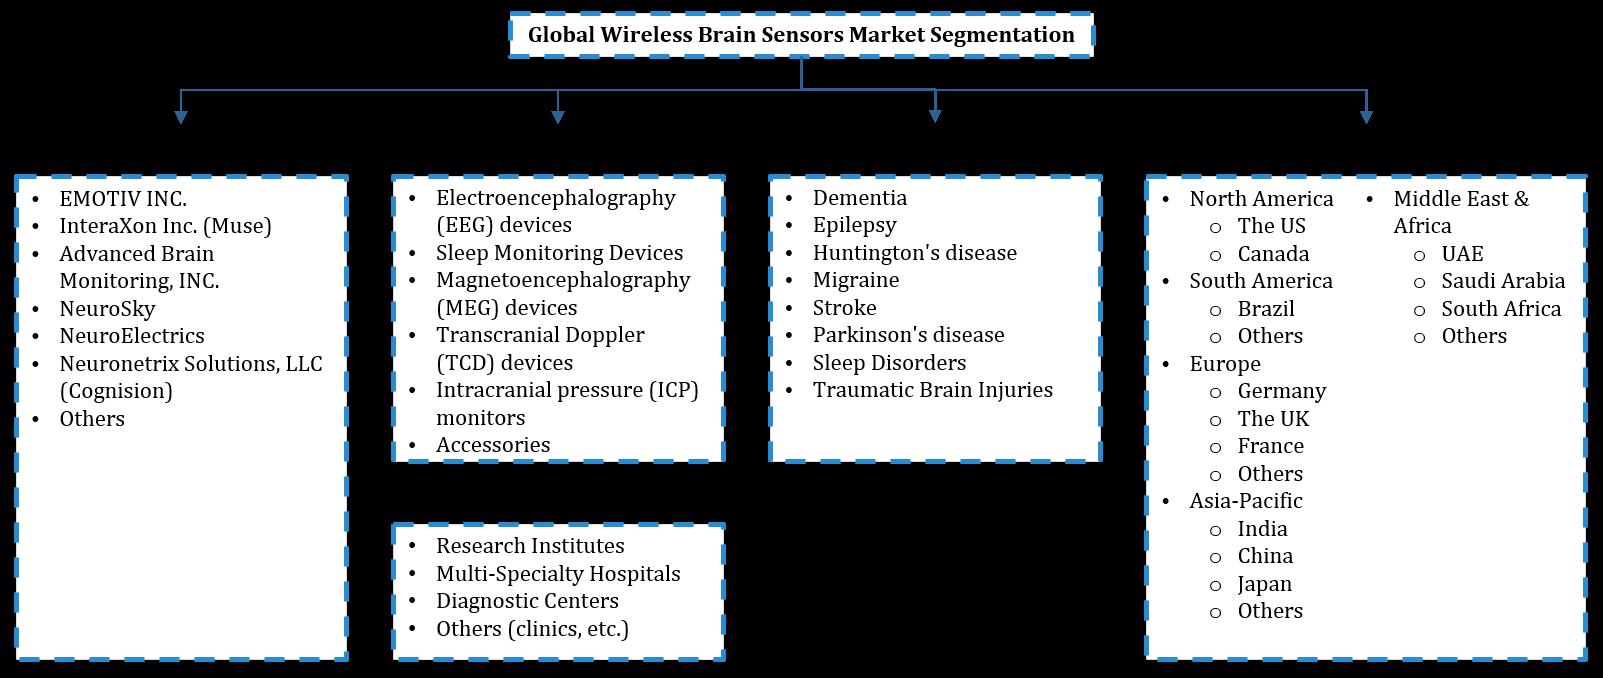 Global Wireless Brain Sensors Market Segmentation